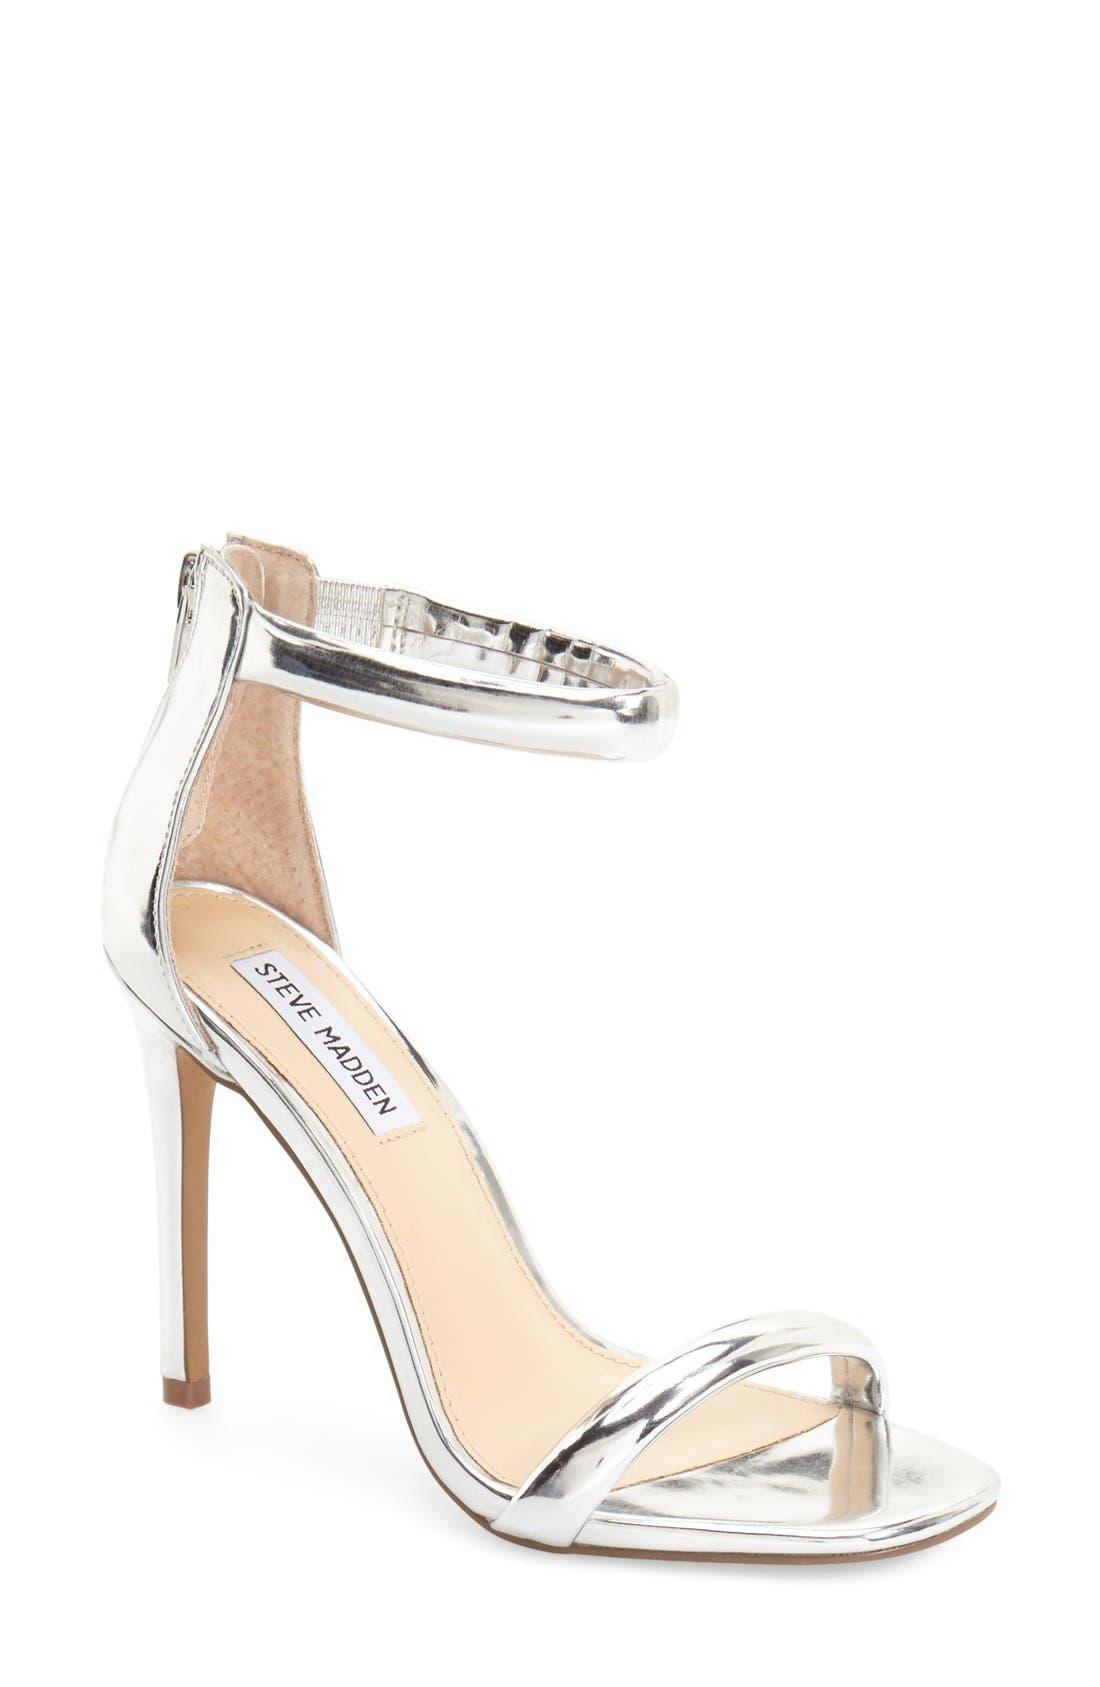 Alternate Image 1 Selected - Steve Madden 'Fancier' Ankle Strap Sandal (Women)